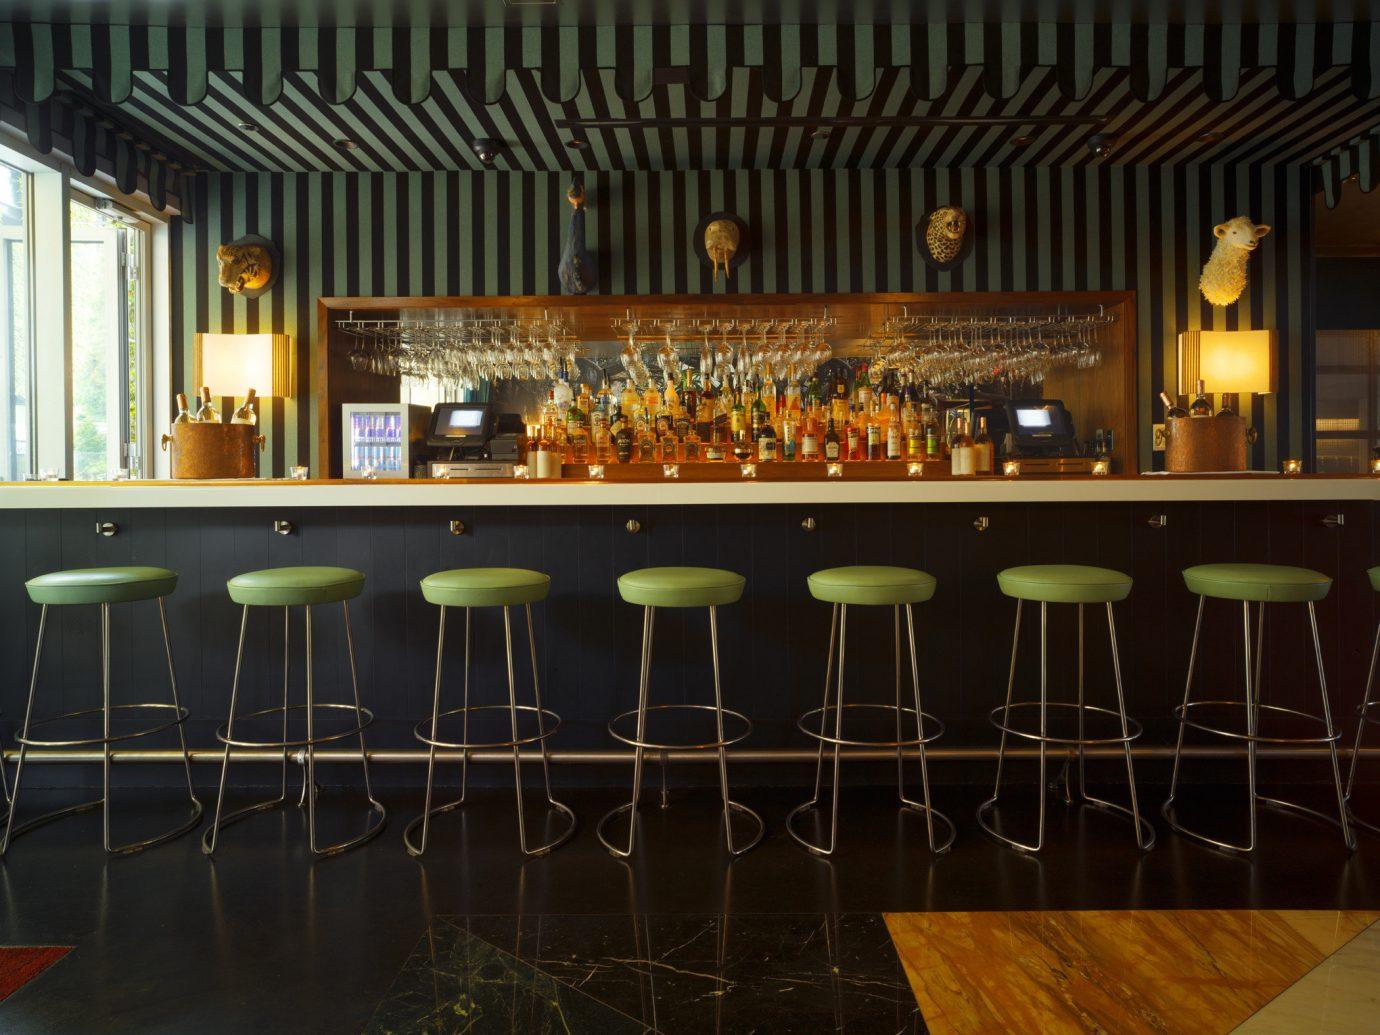 Hotels indoor auditorium function hall restaurant Bar meal interior design ballroom